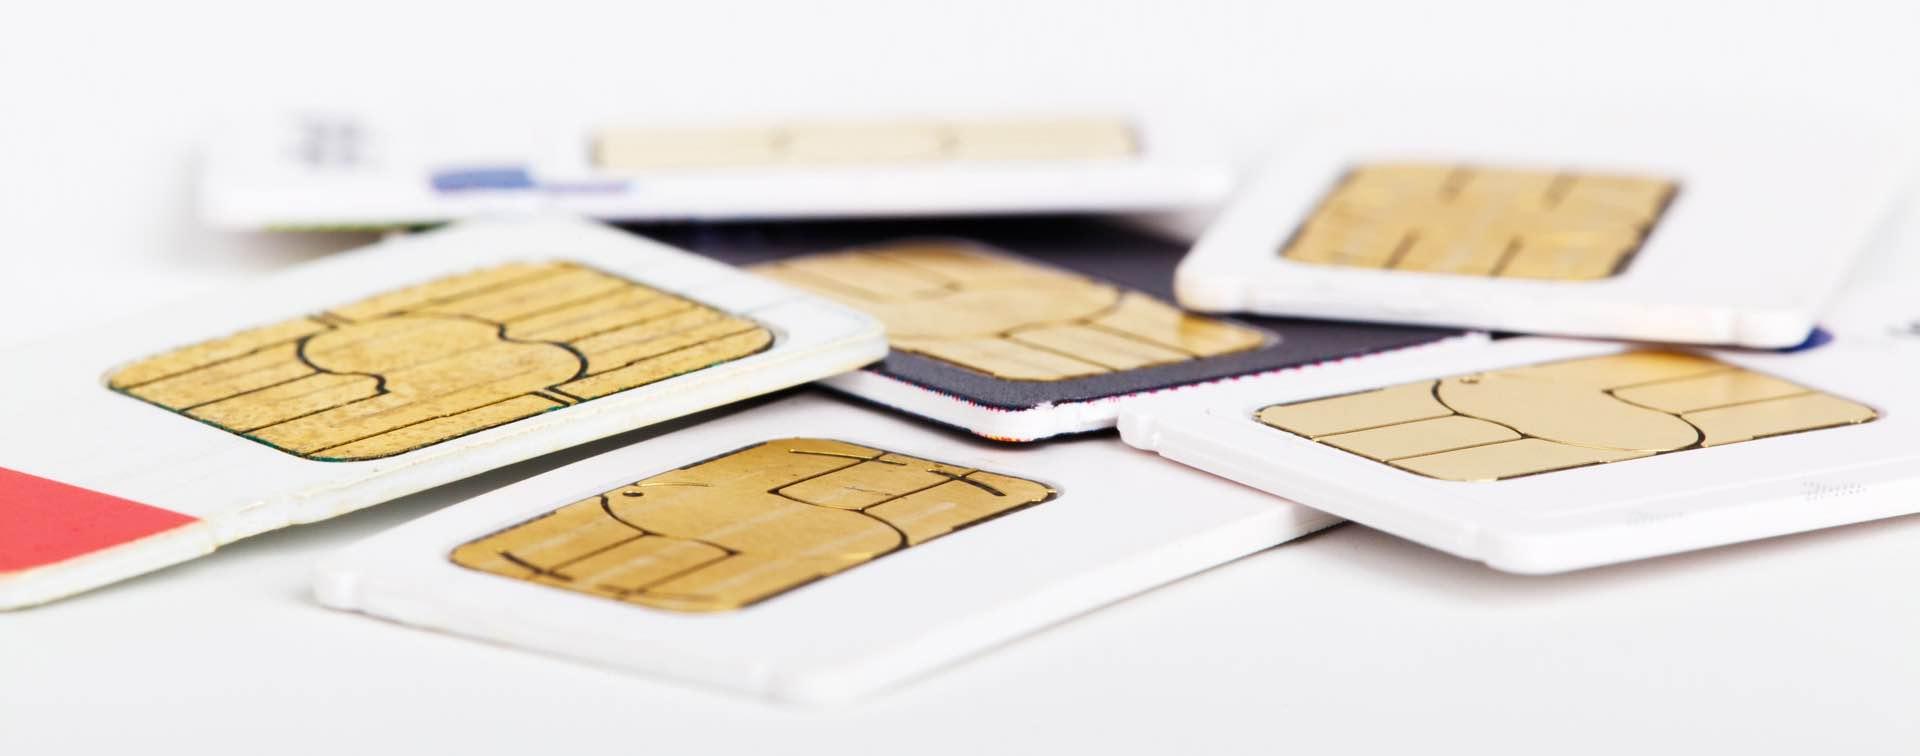 sim-cards-wide